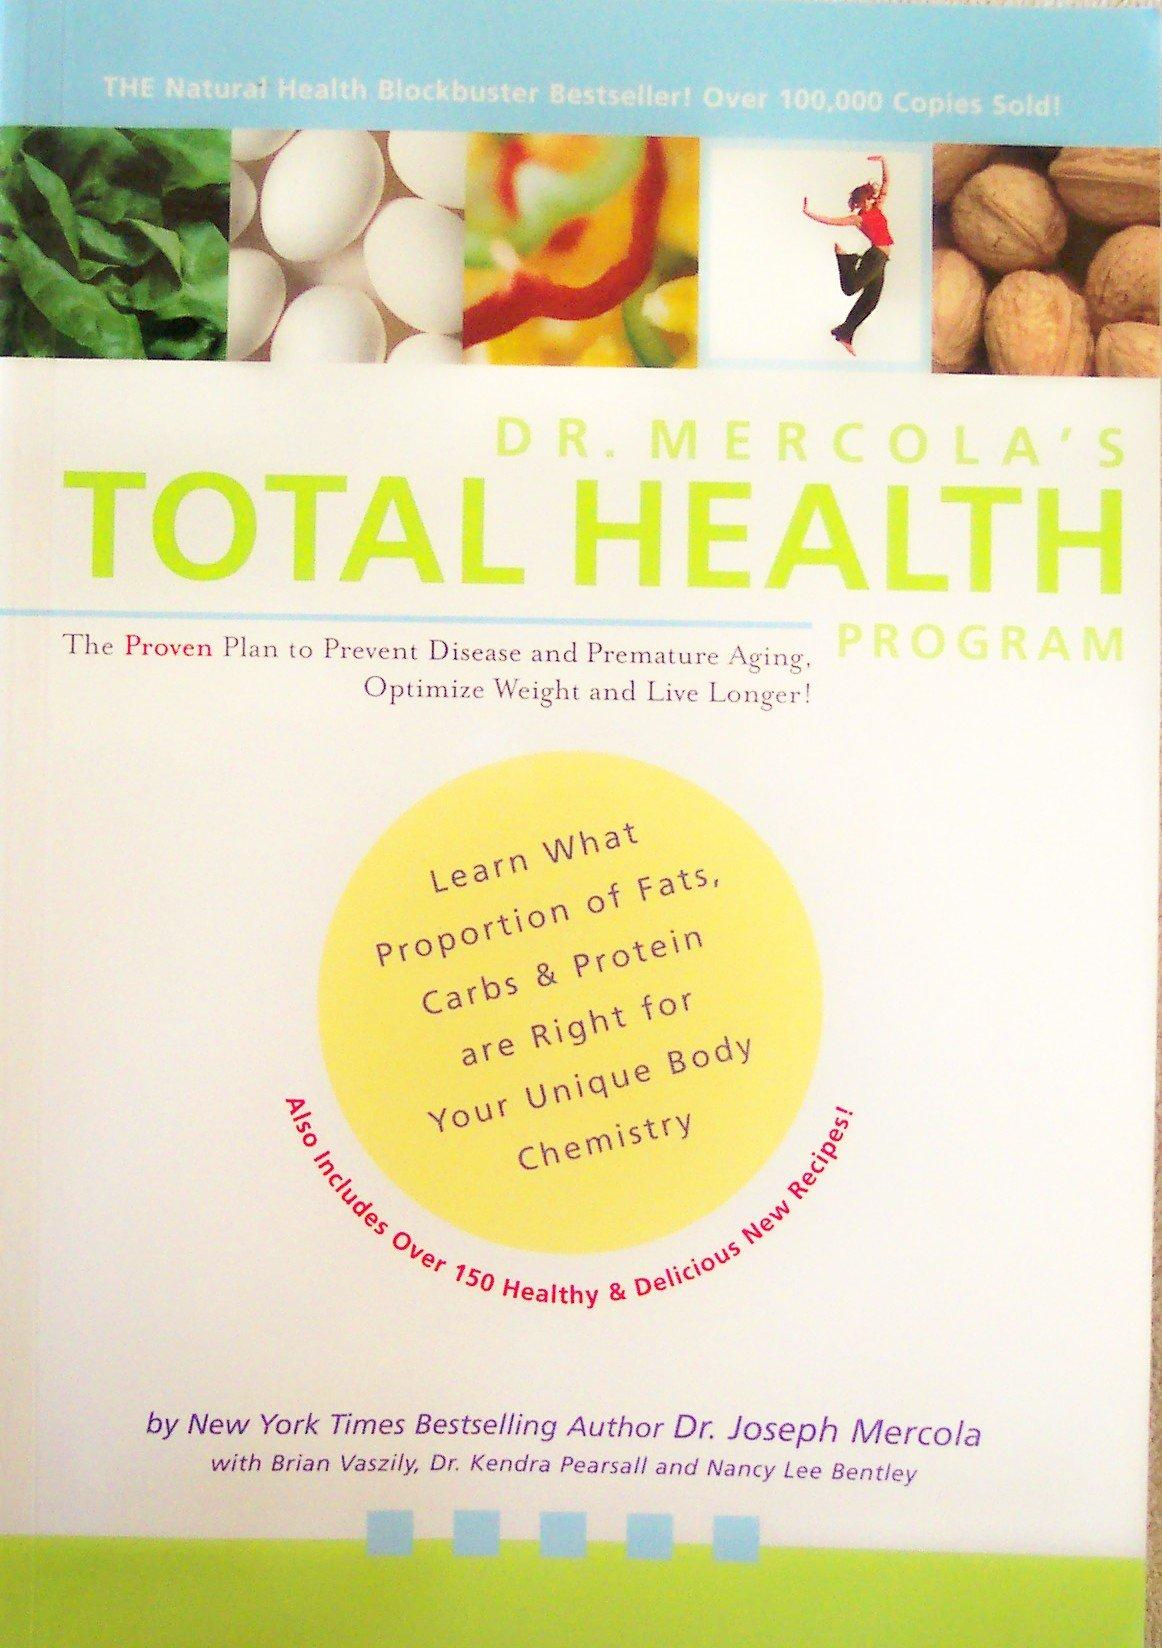 Download Total Health Cook book Program